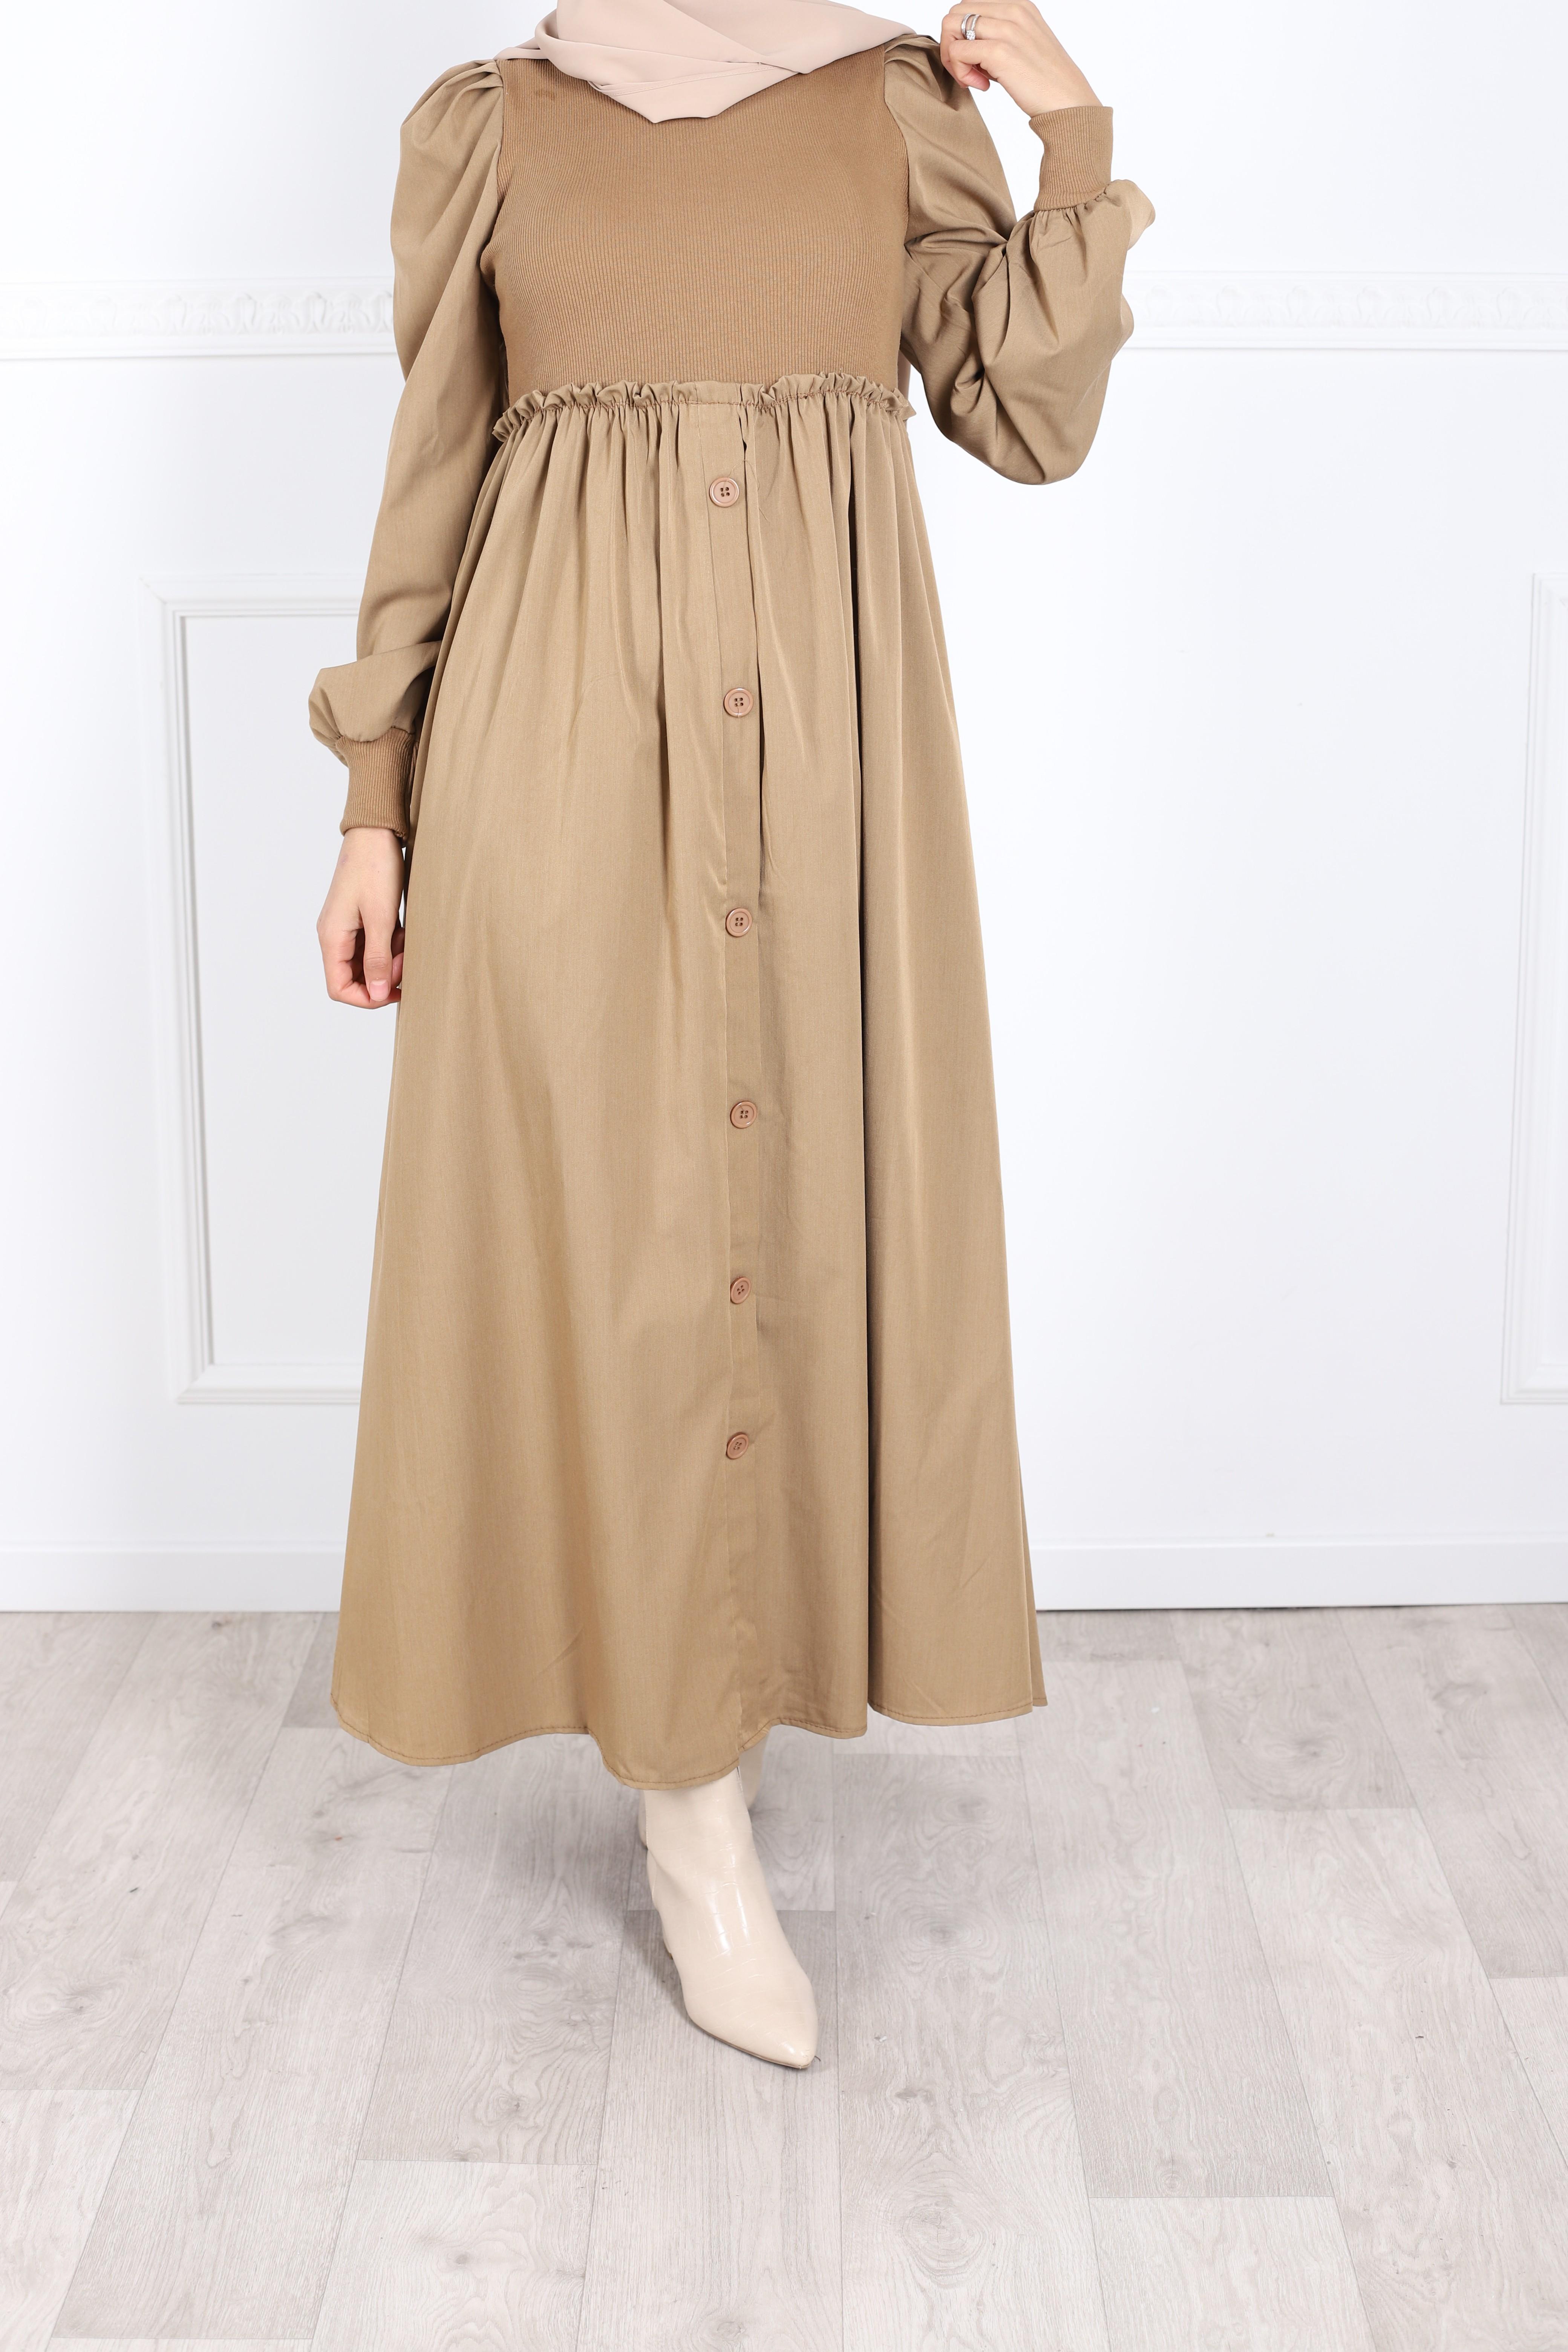 Robe dora camel